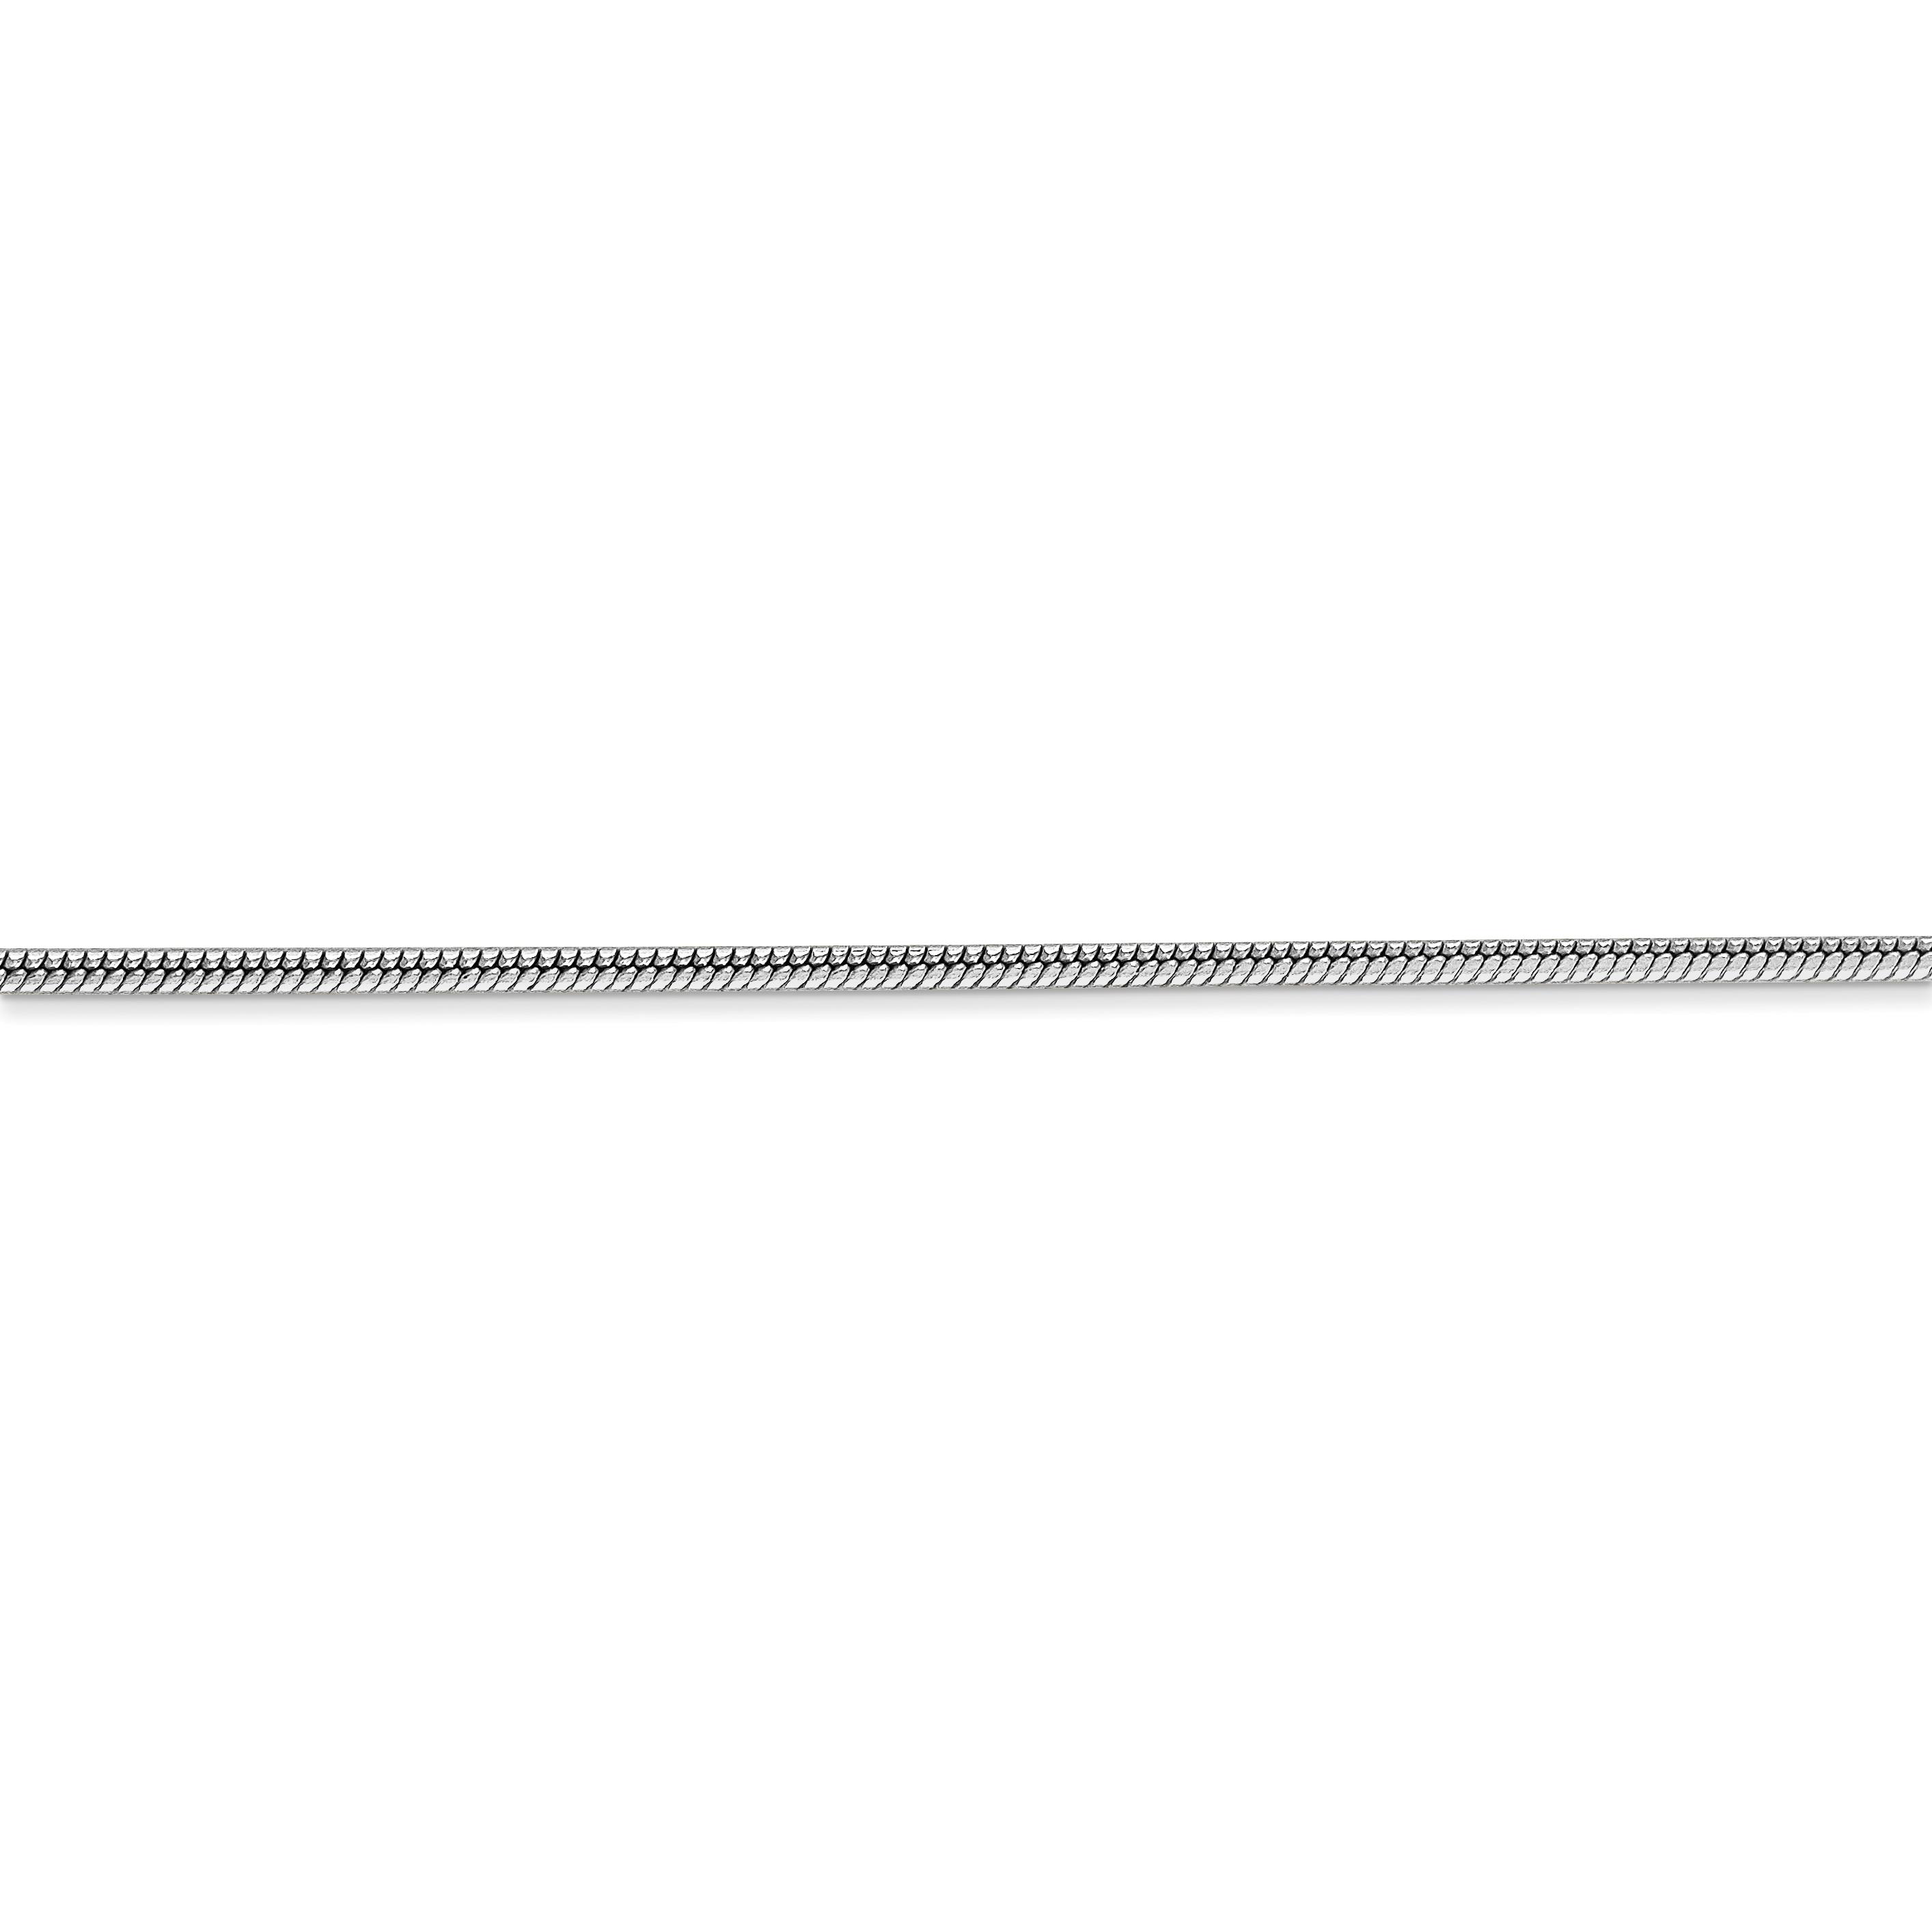 14K White Gold 1.6mm Round Snake Chain 30 Inch - image 3 de 5